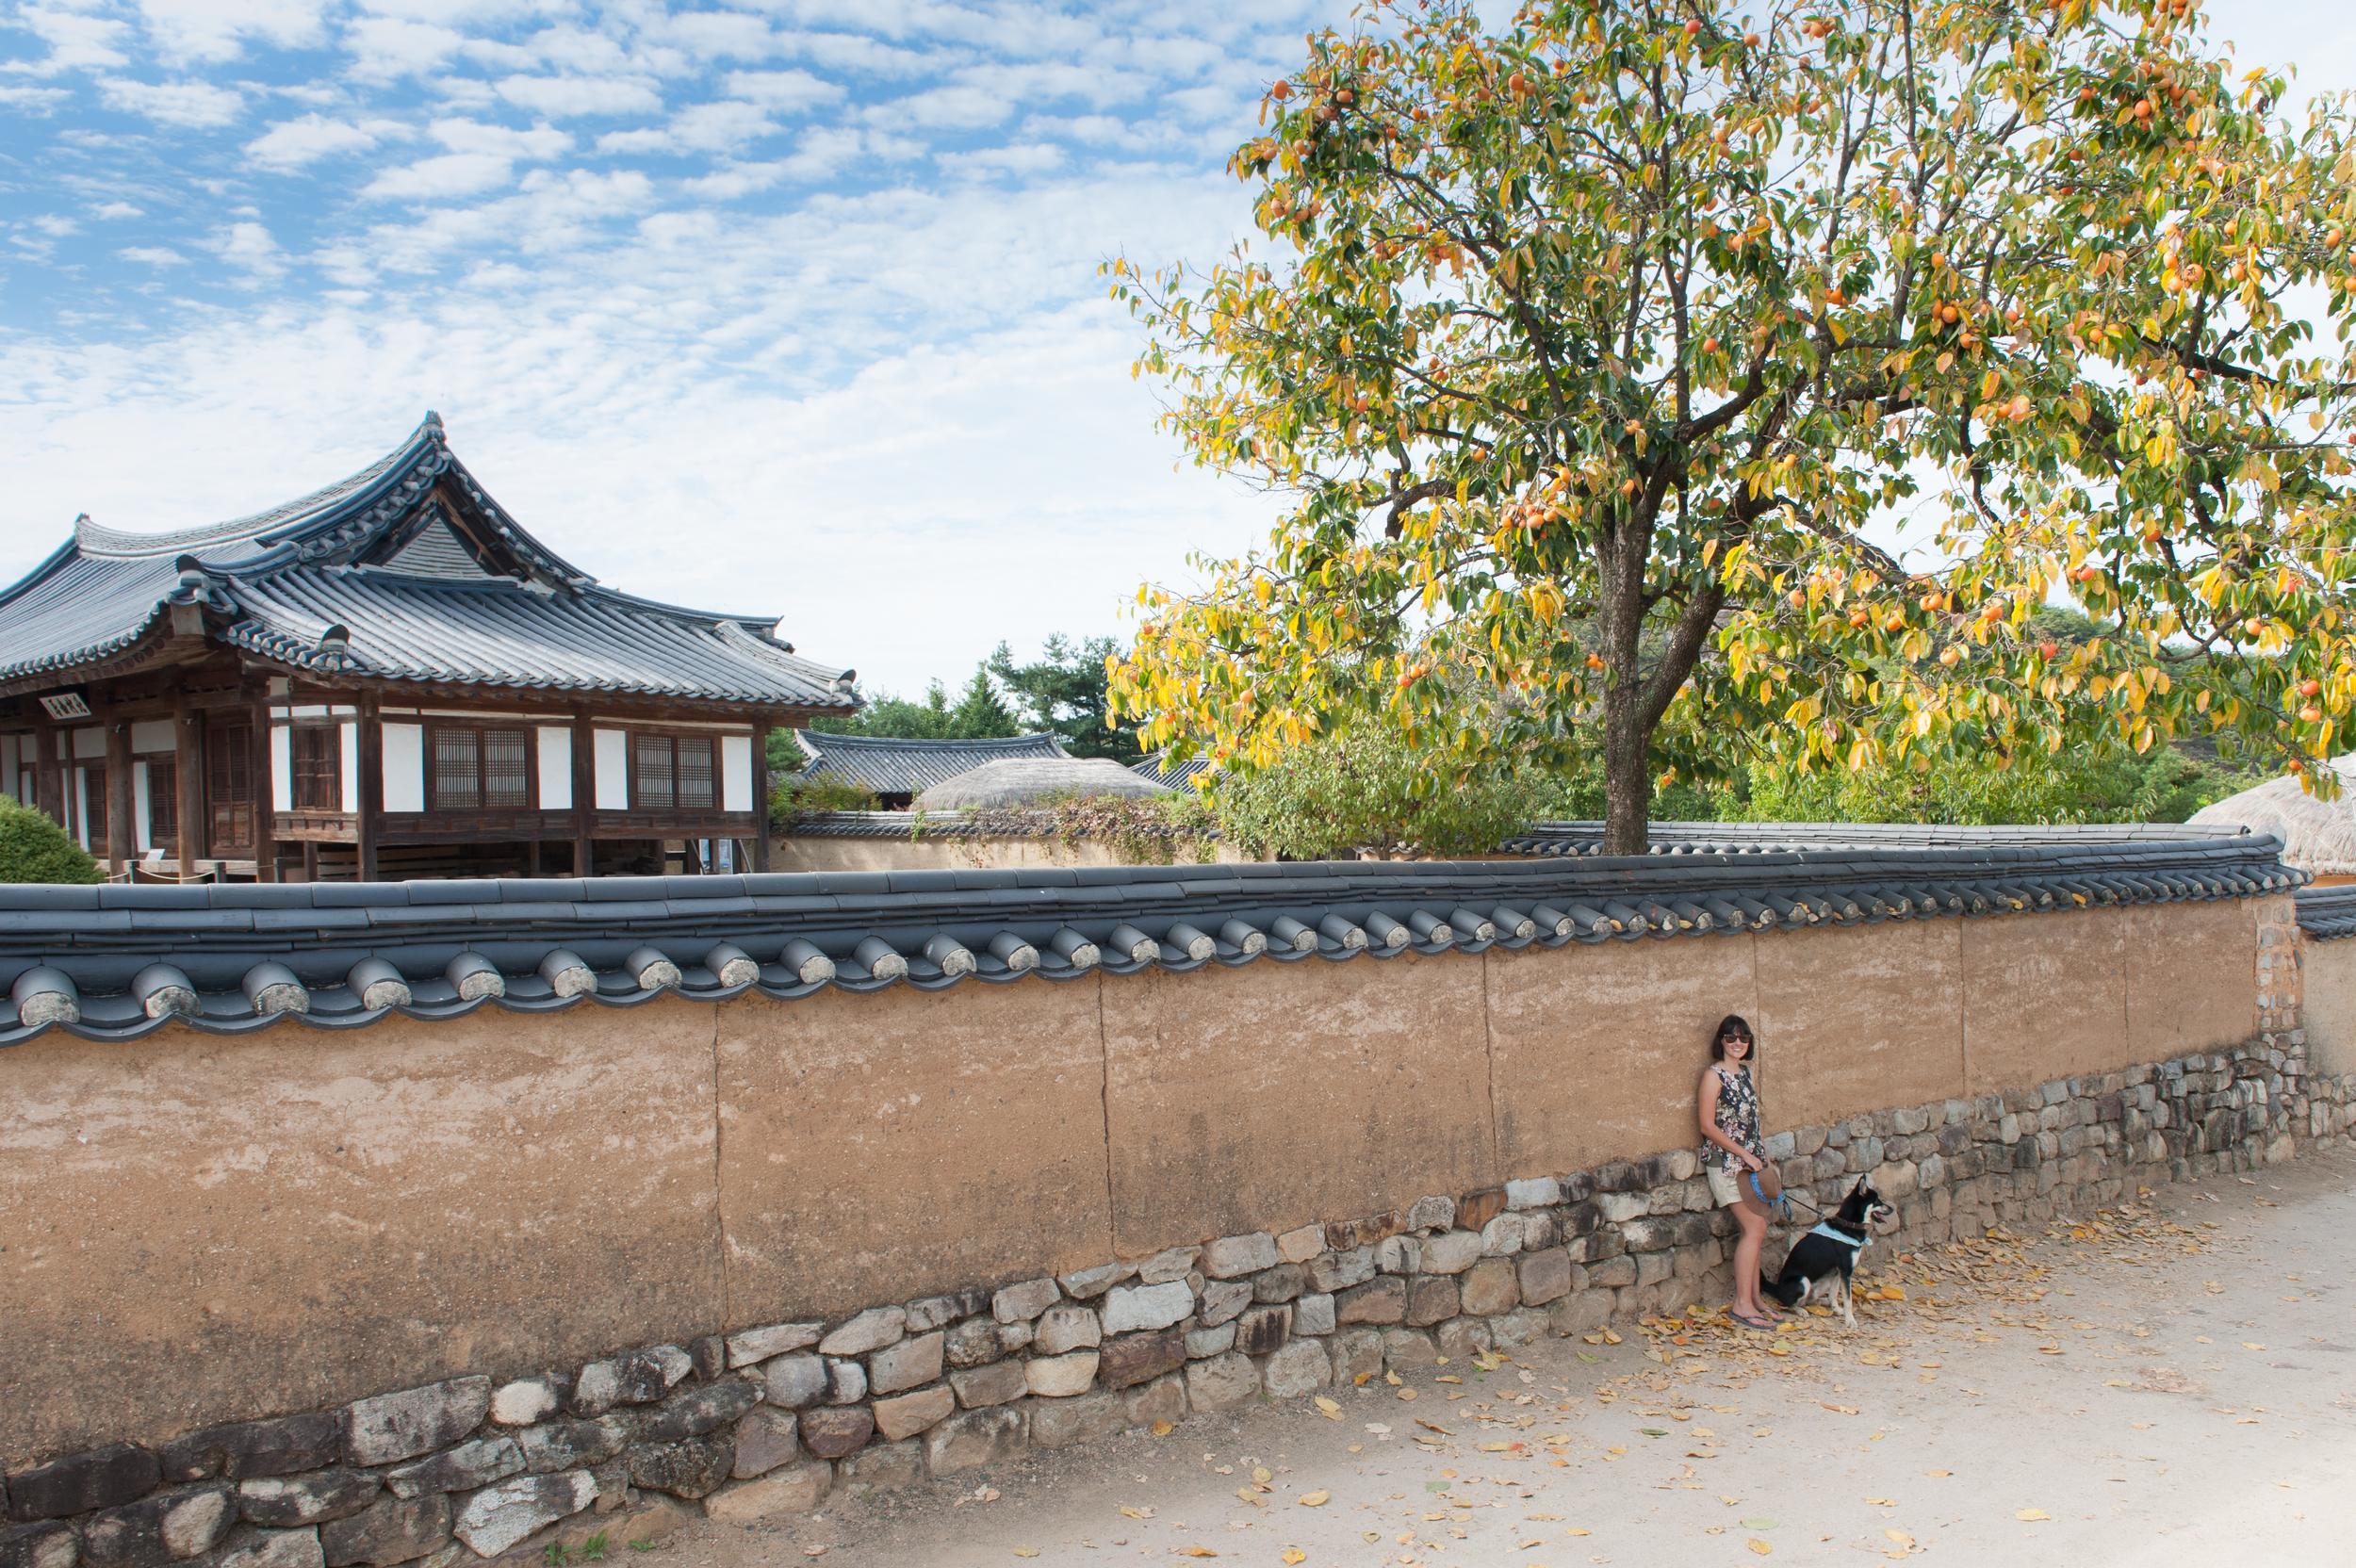 Camping in Korea Chuseok Gangwon Province (129 of 135).jpg